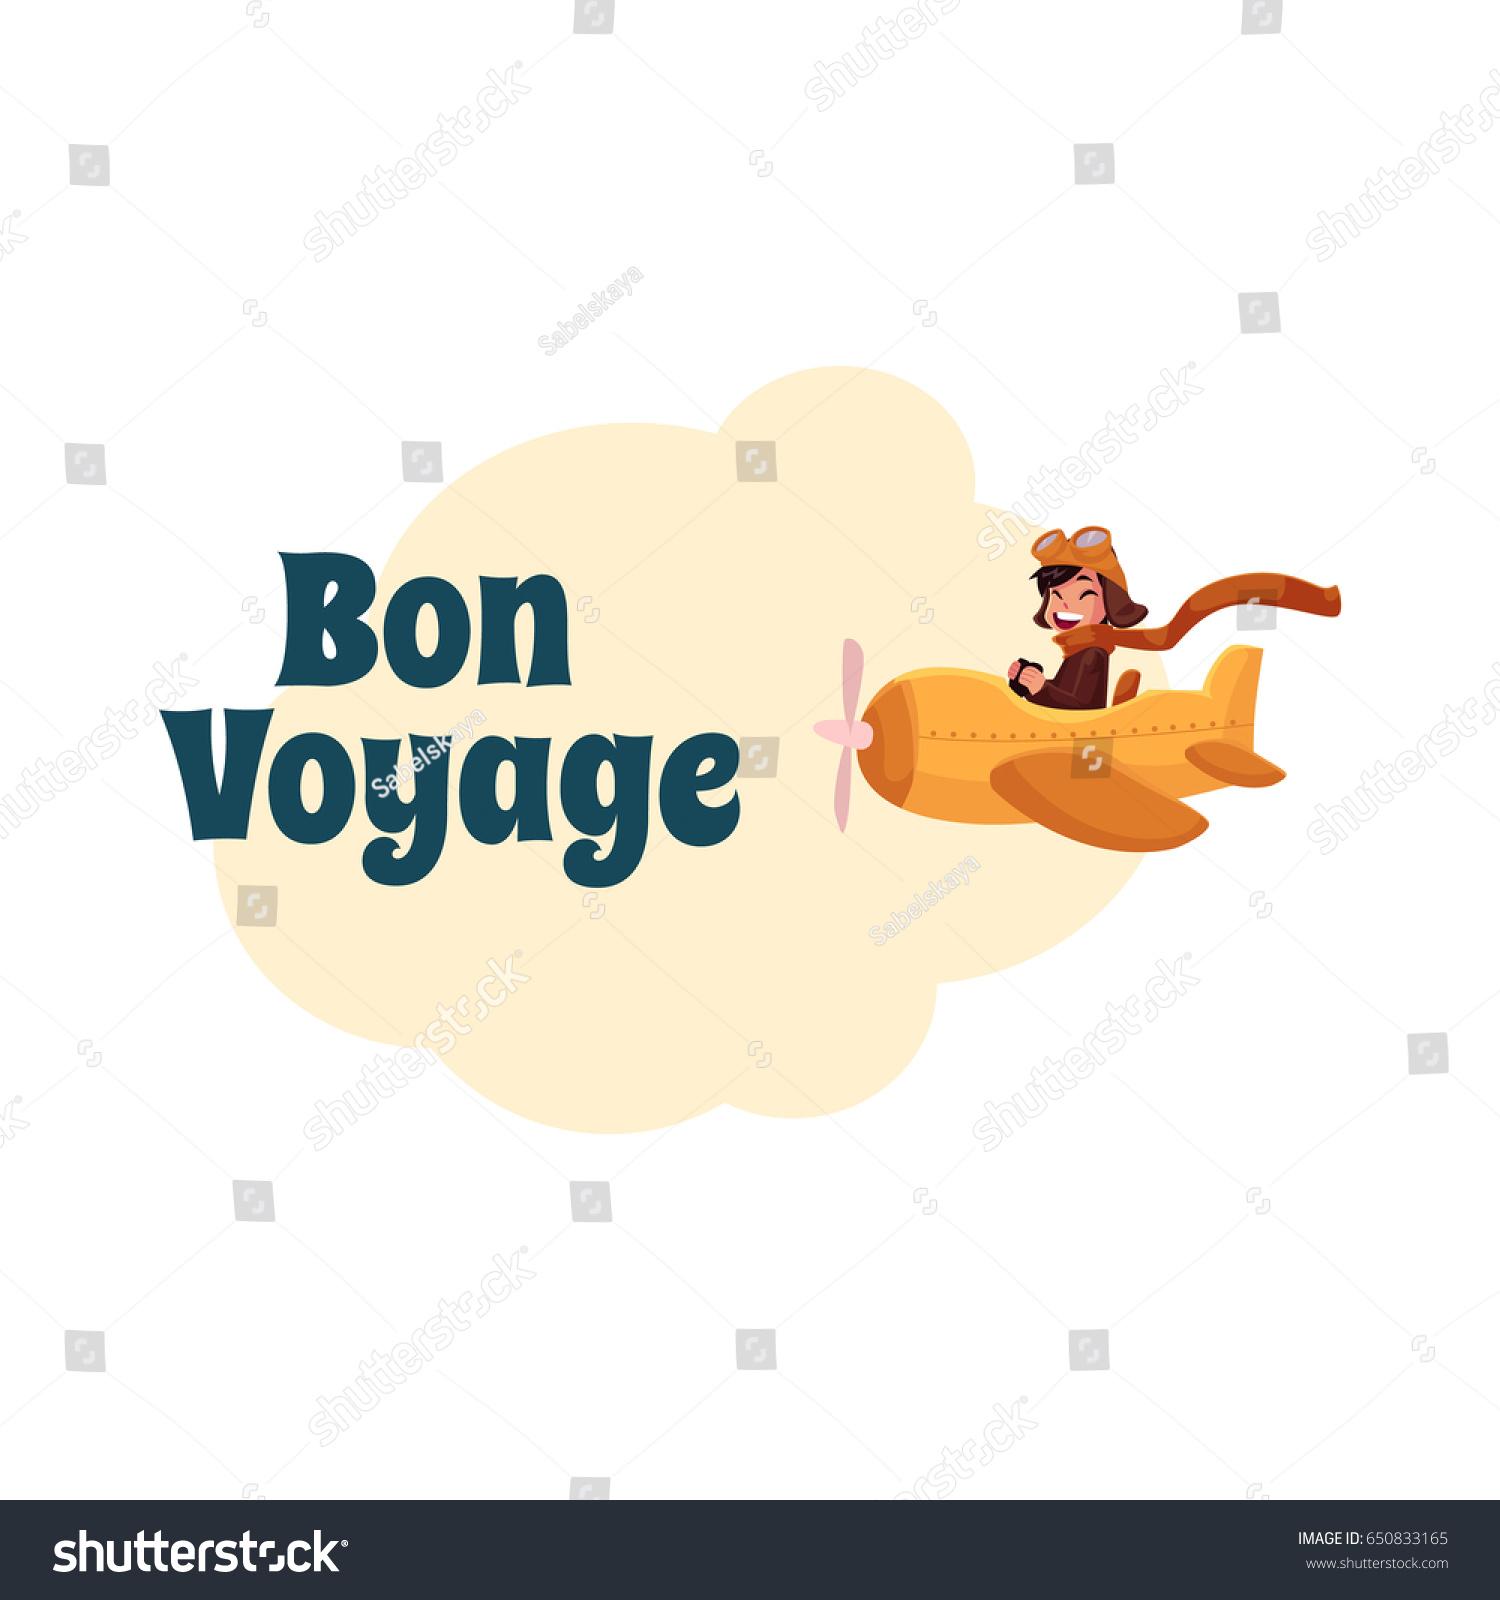 bon voyage postcard banner poster design stock vector royalty free